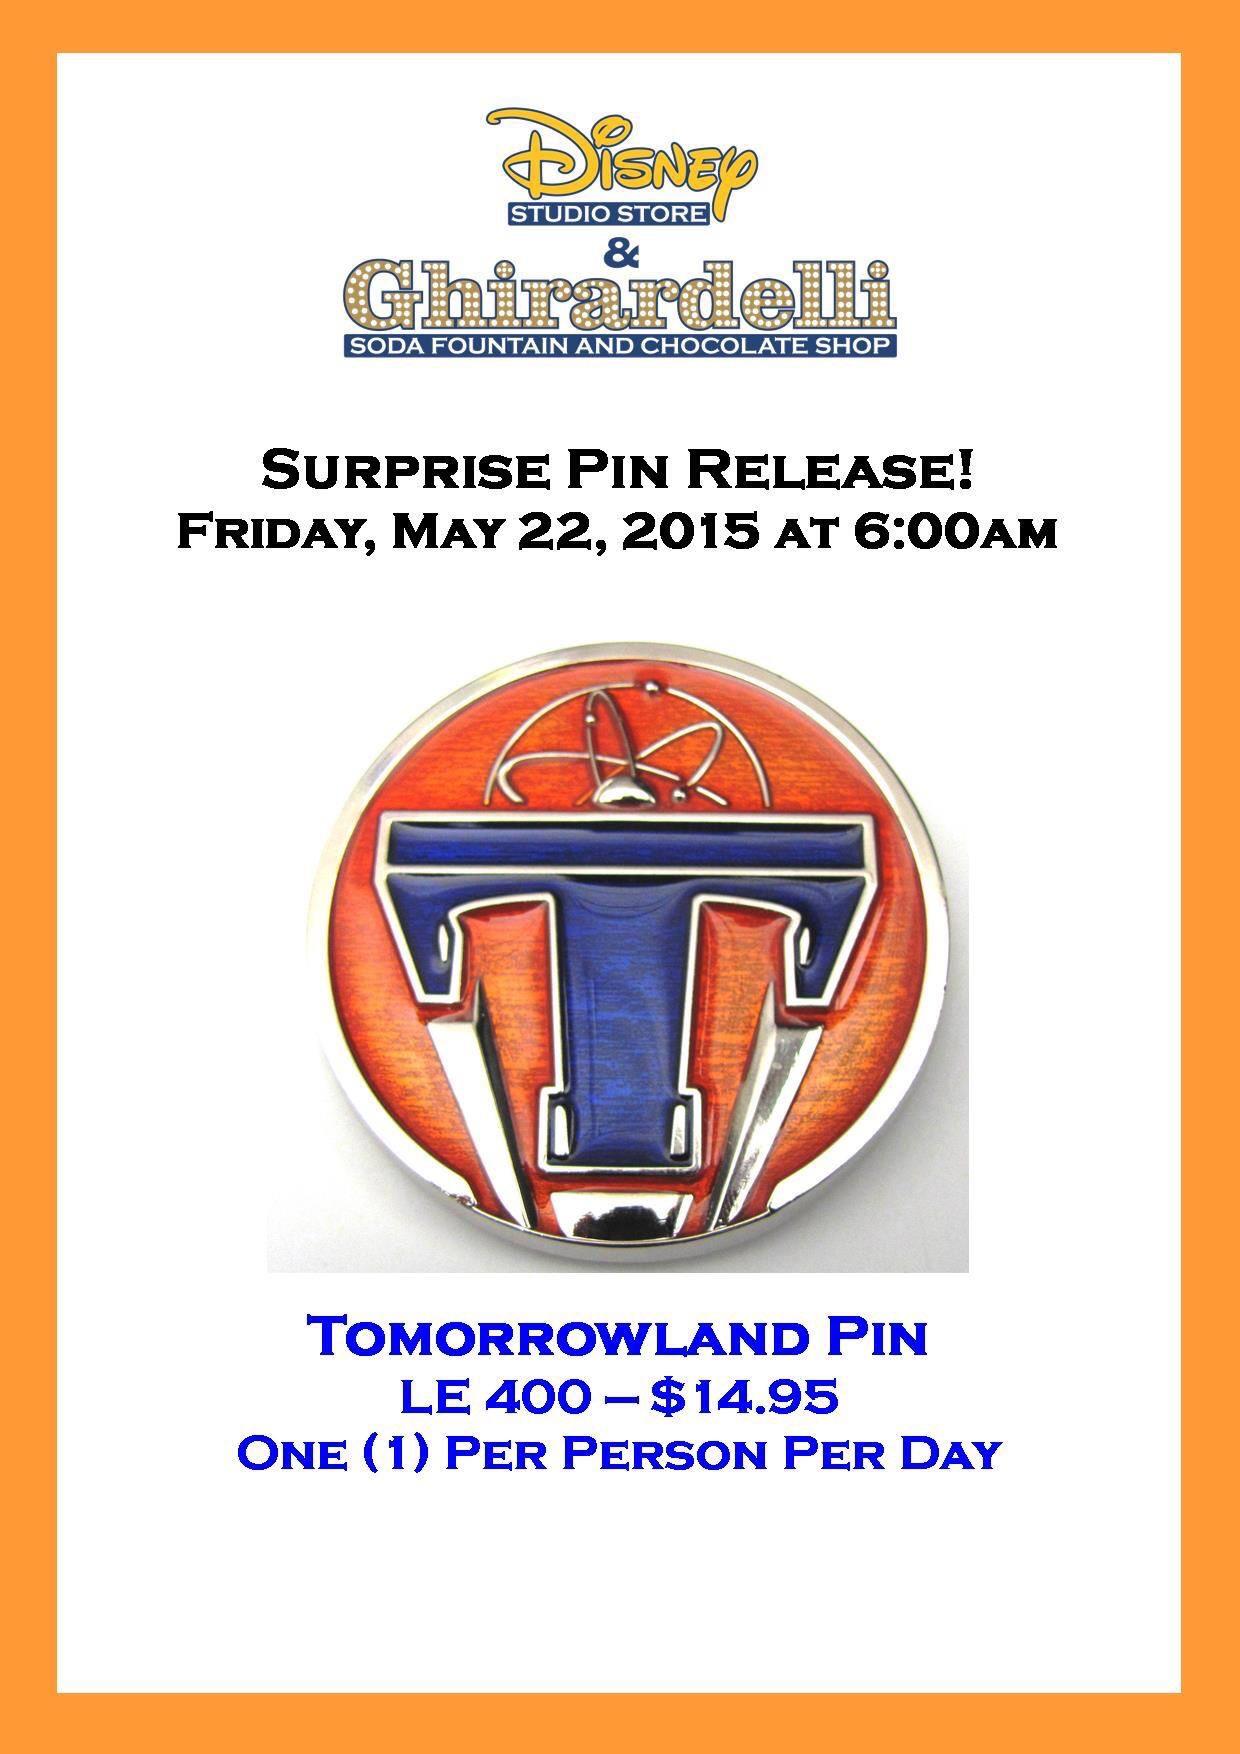 Tomorrowland Pin Released At Disney Studio Store